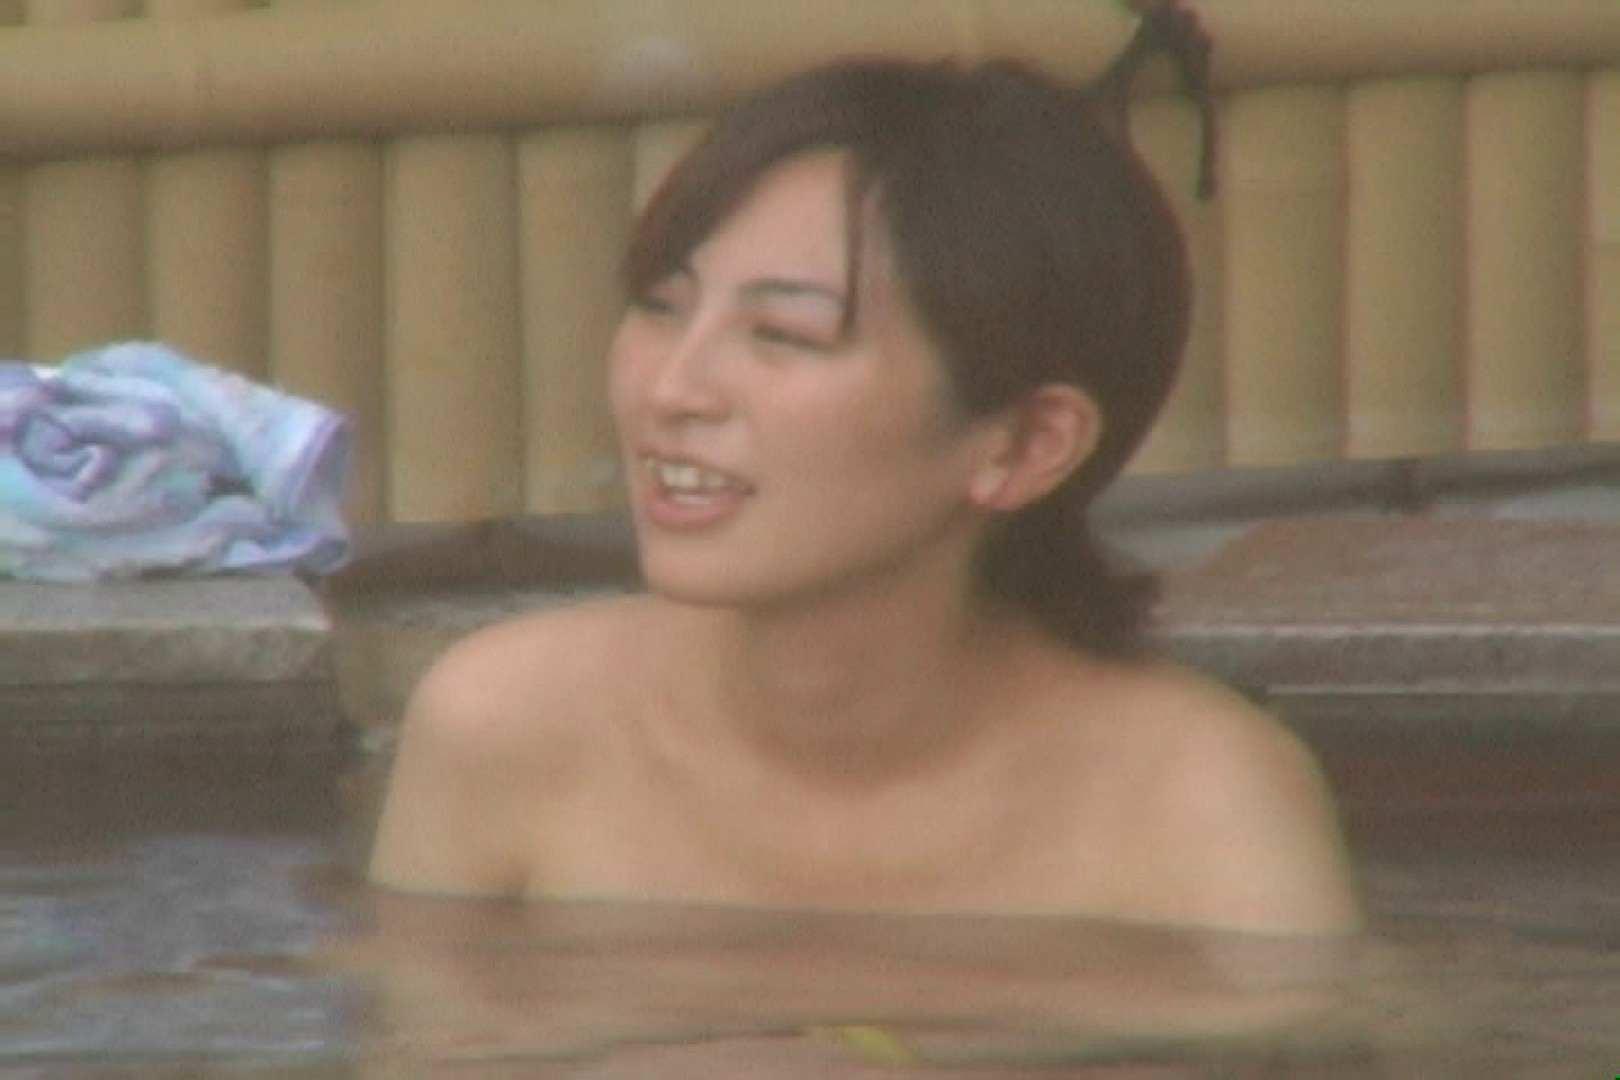 Aquaな露天風呂Vol.26【VIP】 OLセックス 盗み撮りオマンコ動画キャプチャ 59画像 35